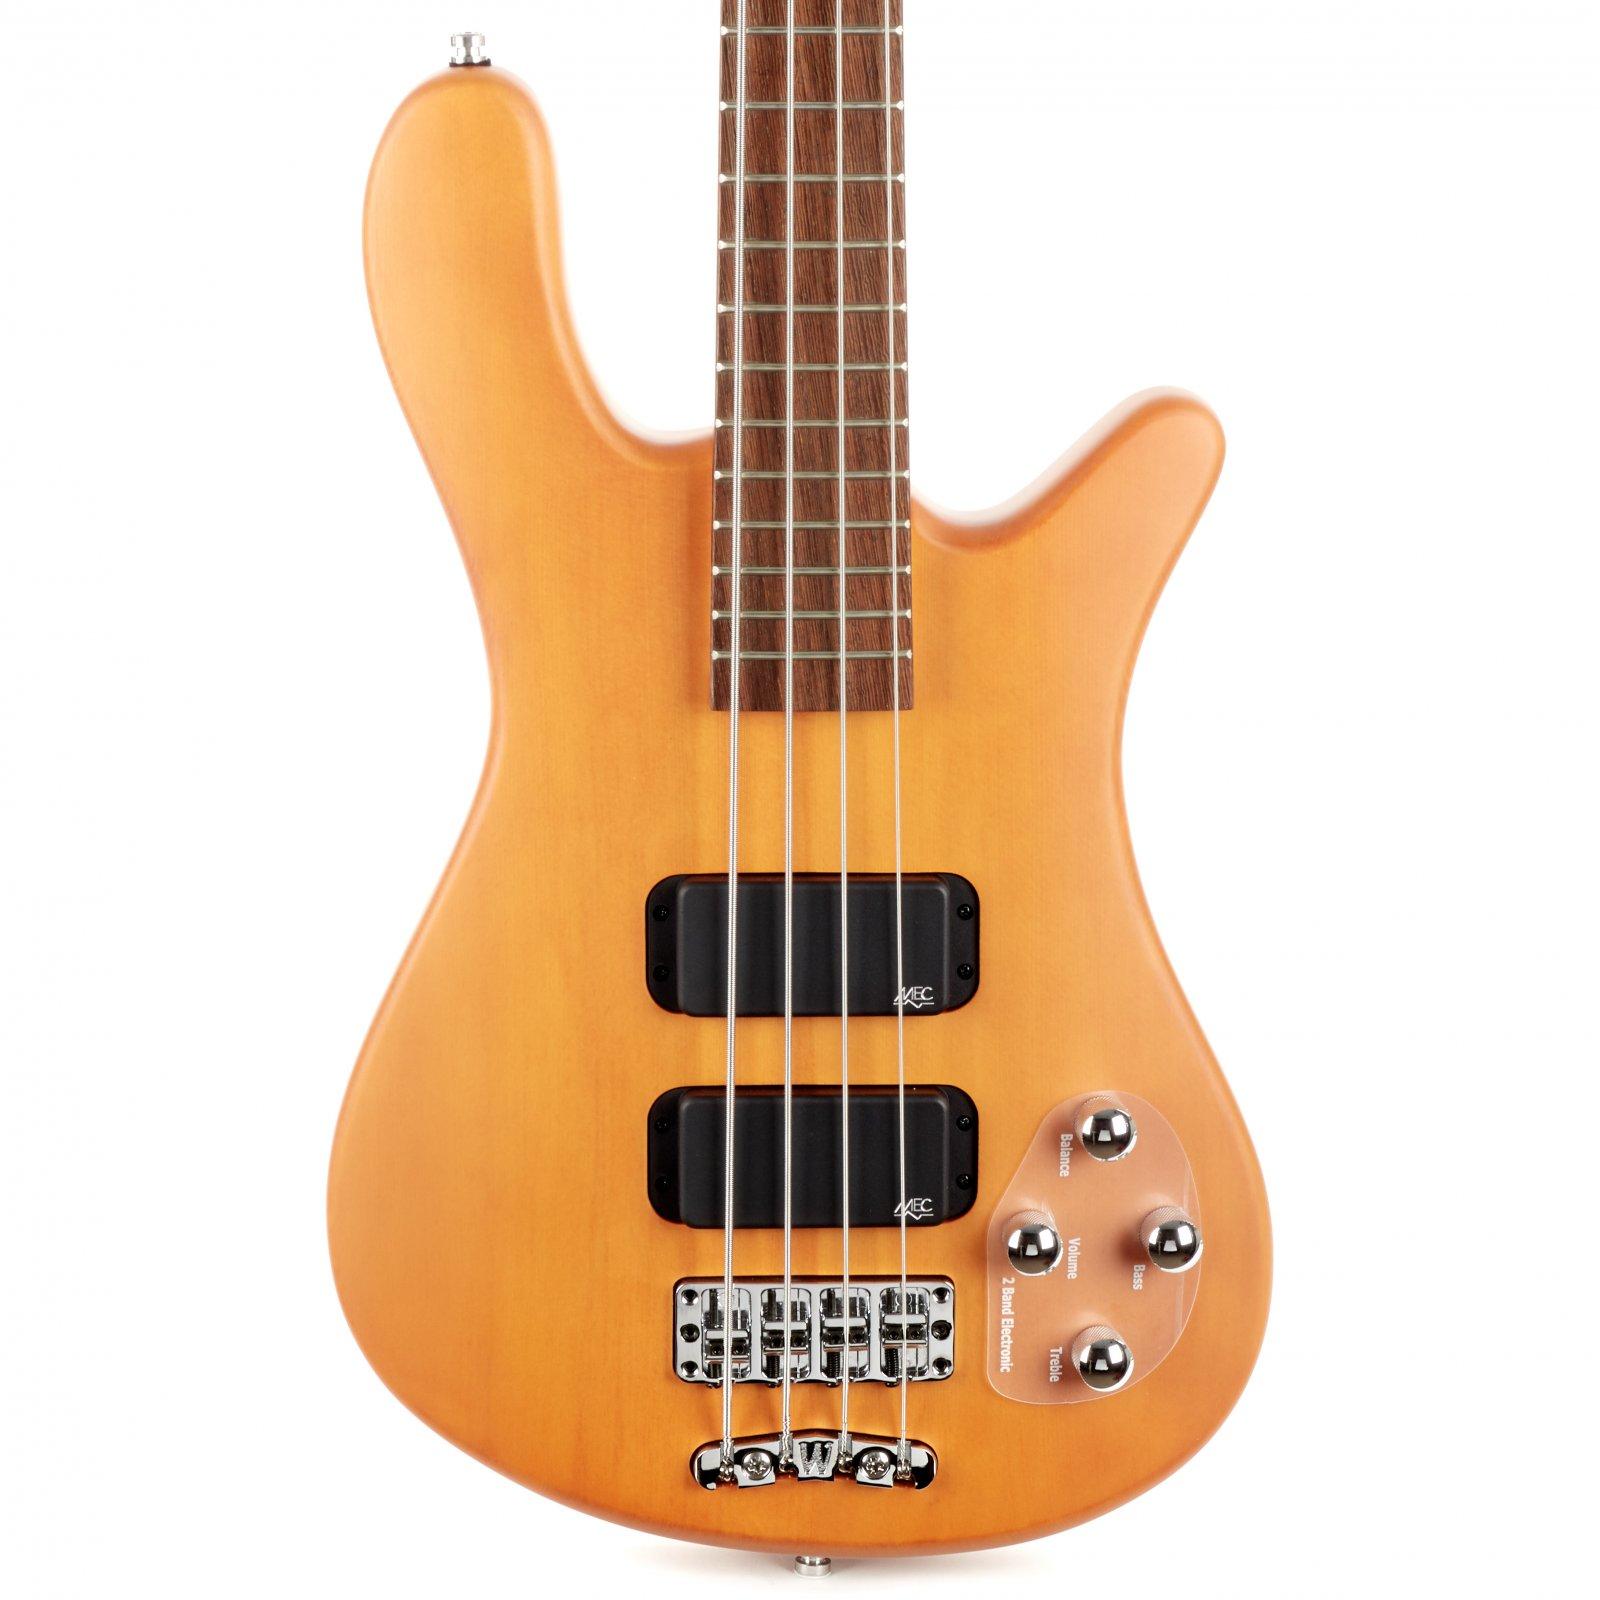 Warwick Rockbass Streamer Standard 4-String Honey Violin Transparent Satin Bass